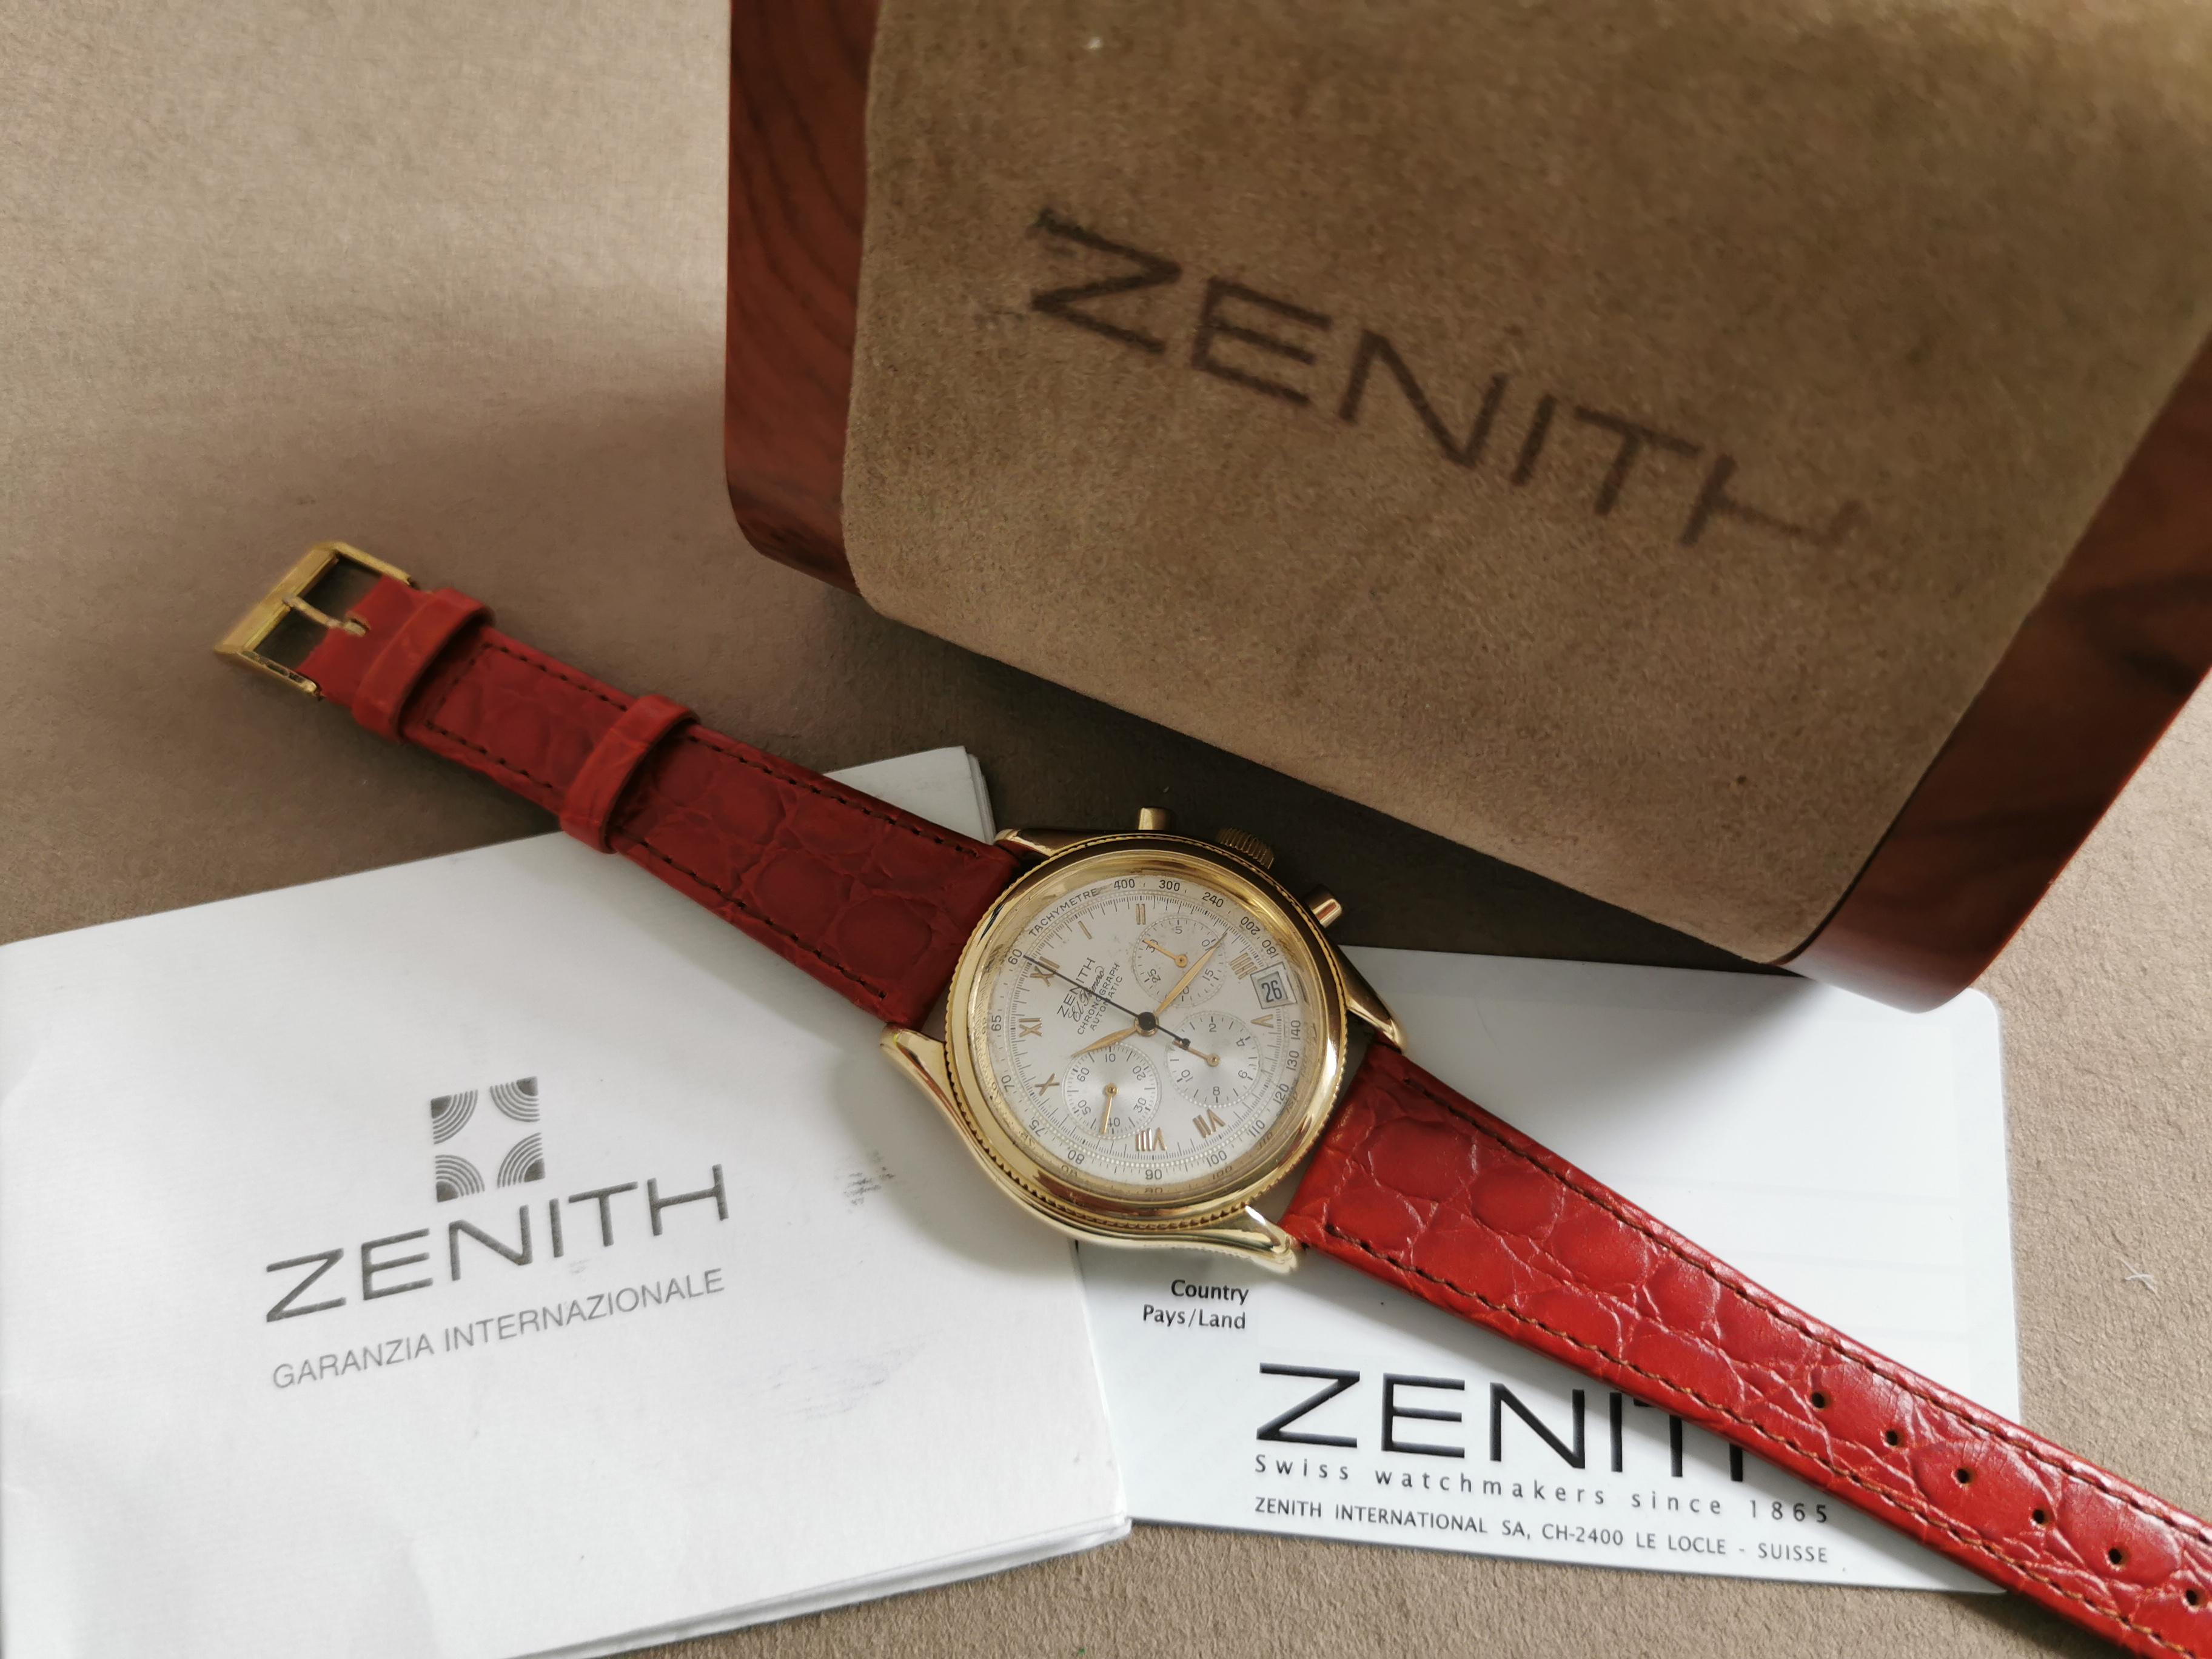 Zenith El Primero El Primero Chronograph 06.0210.400 yellow gold 18 kt full | San Giorgio a Cremano